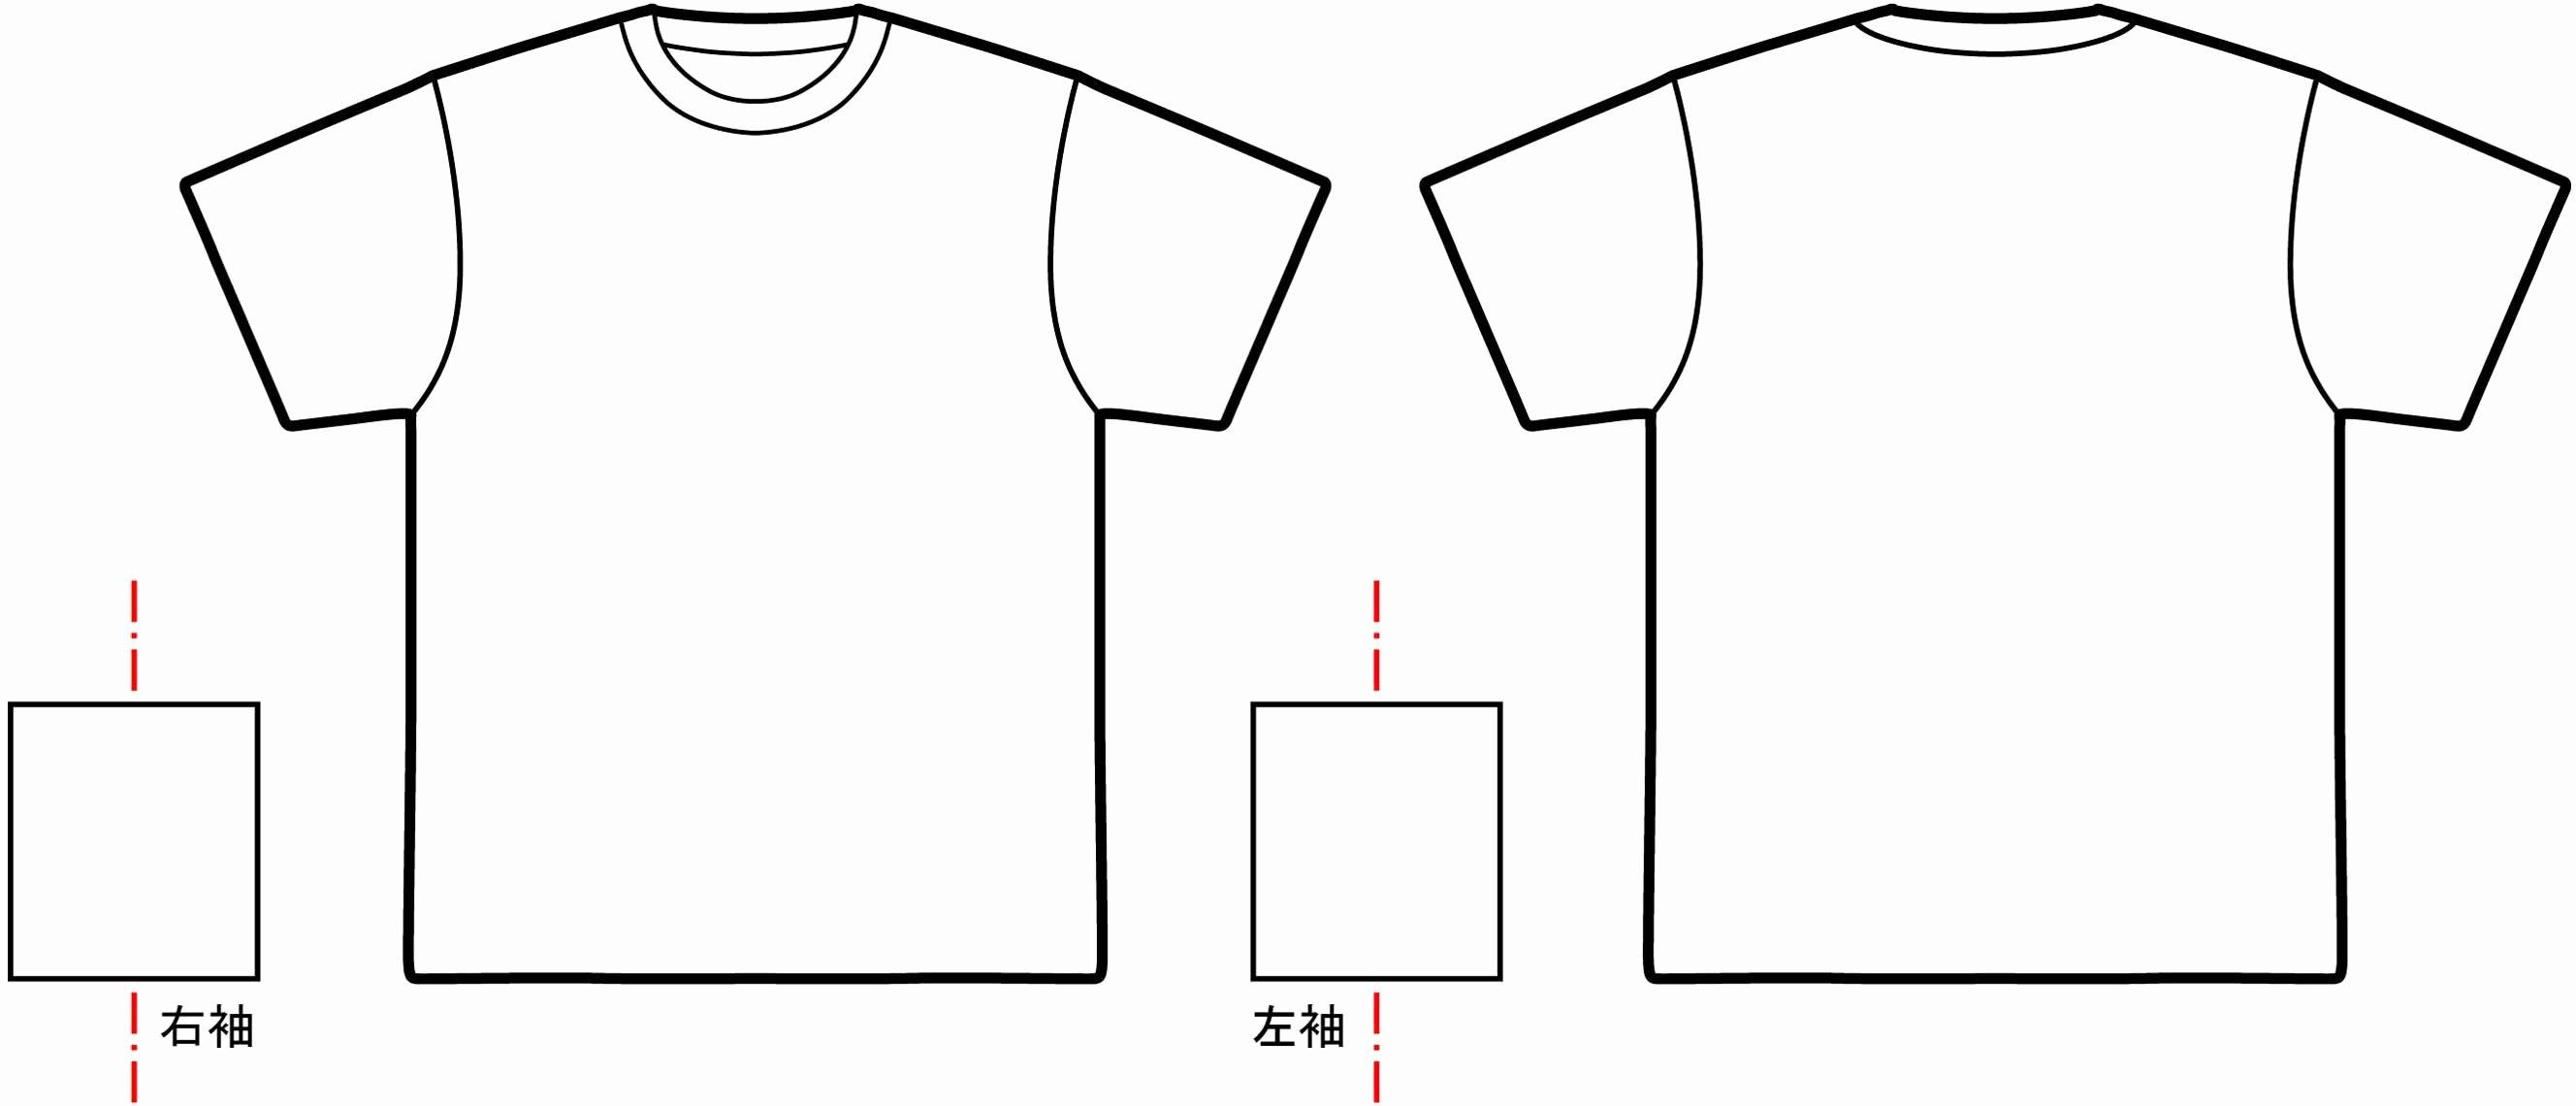 T Shirt Template Illustrator Beautiful T Shirt Template Illustrator